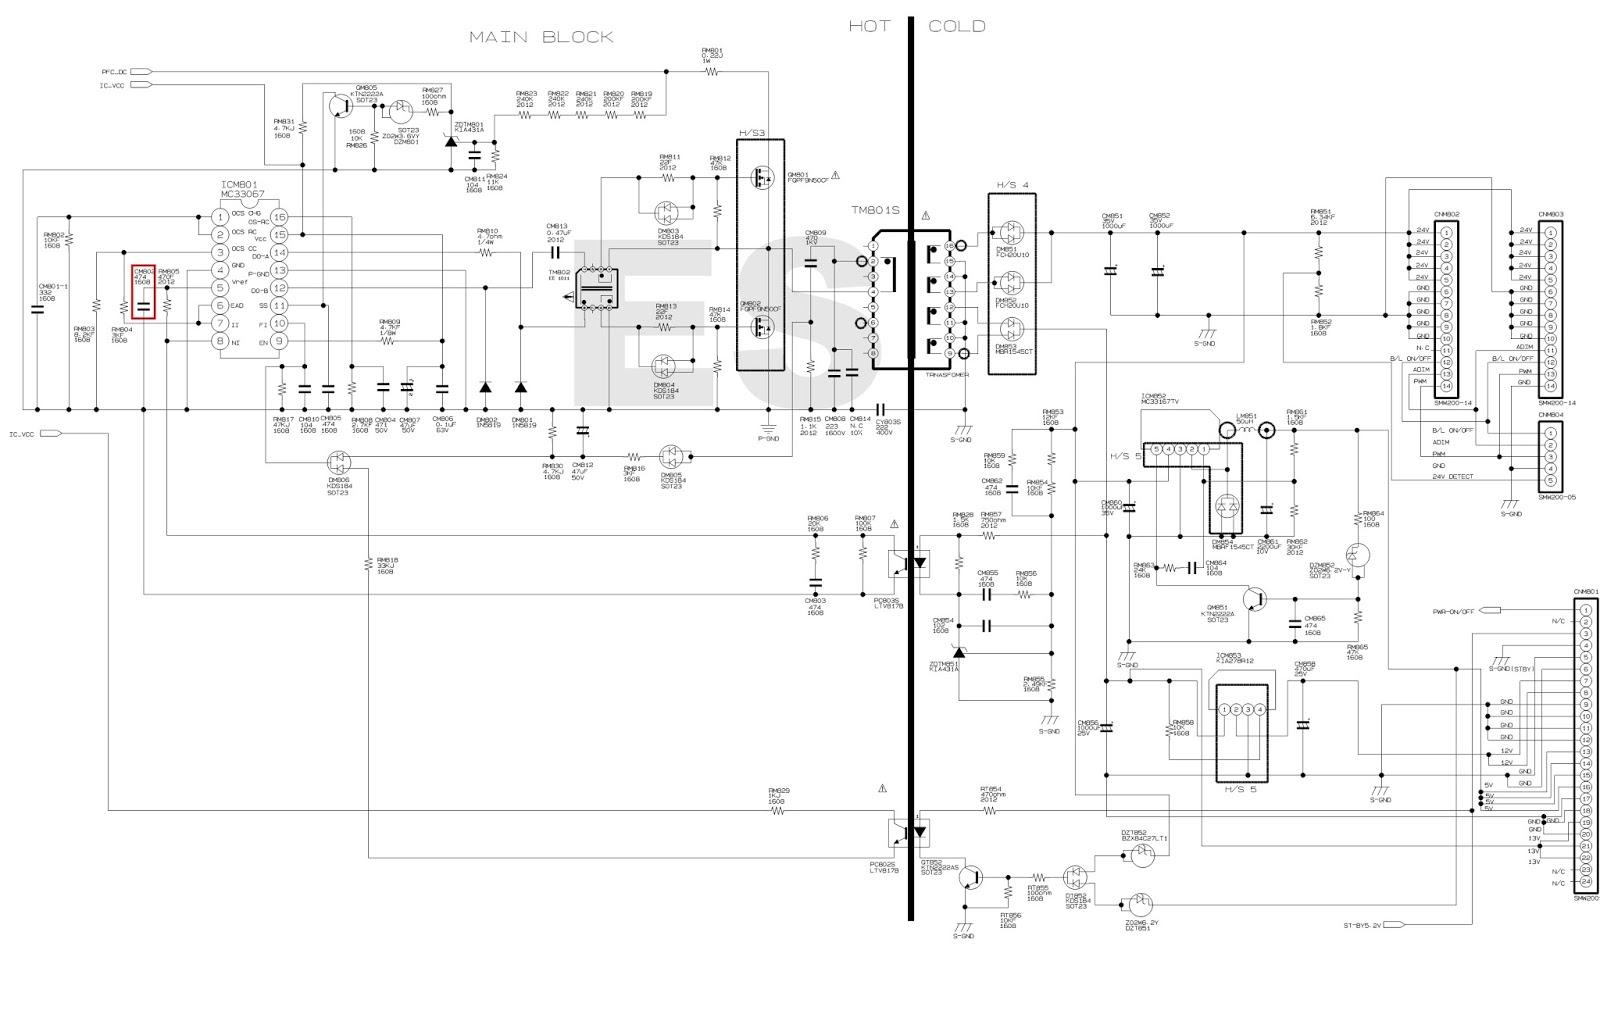 process flow diagram penicillin